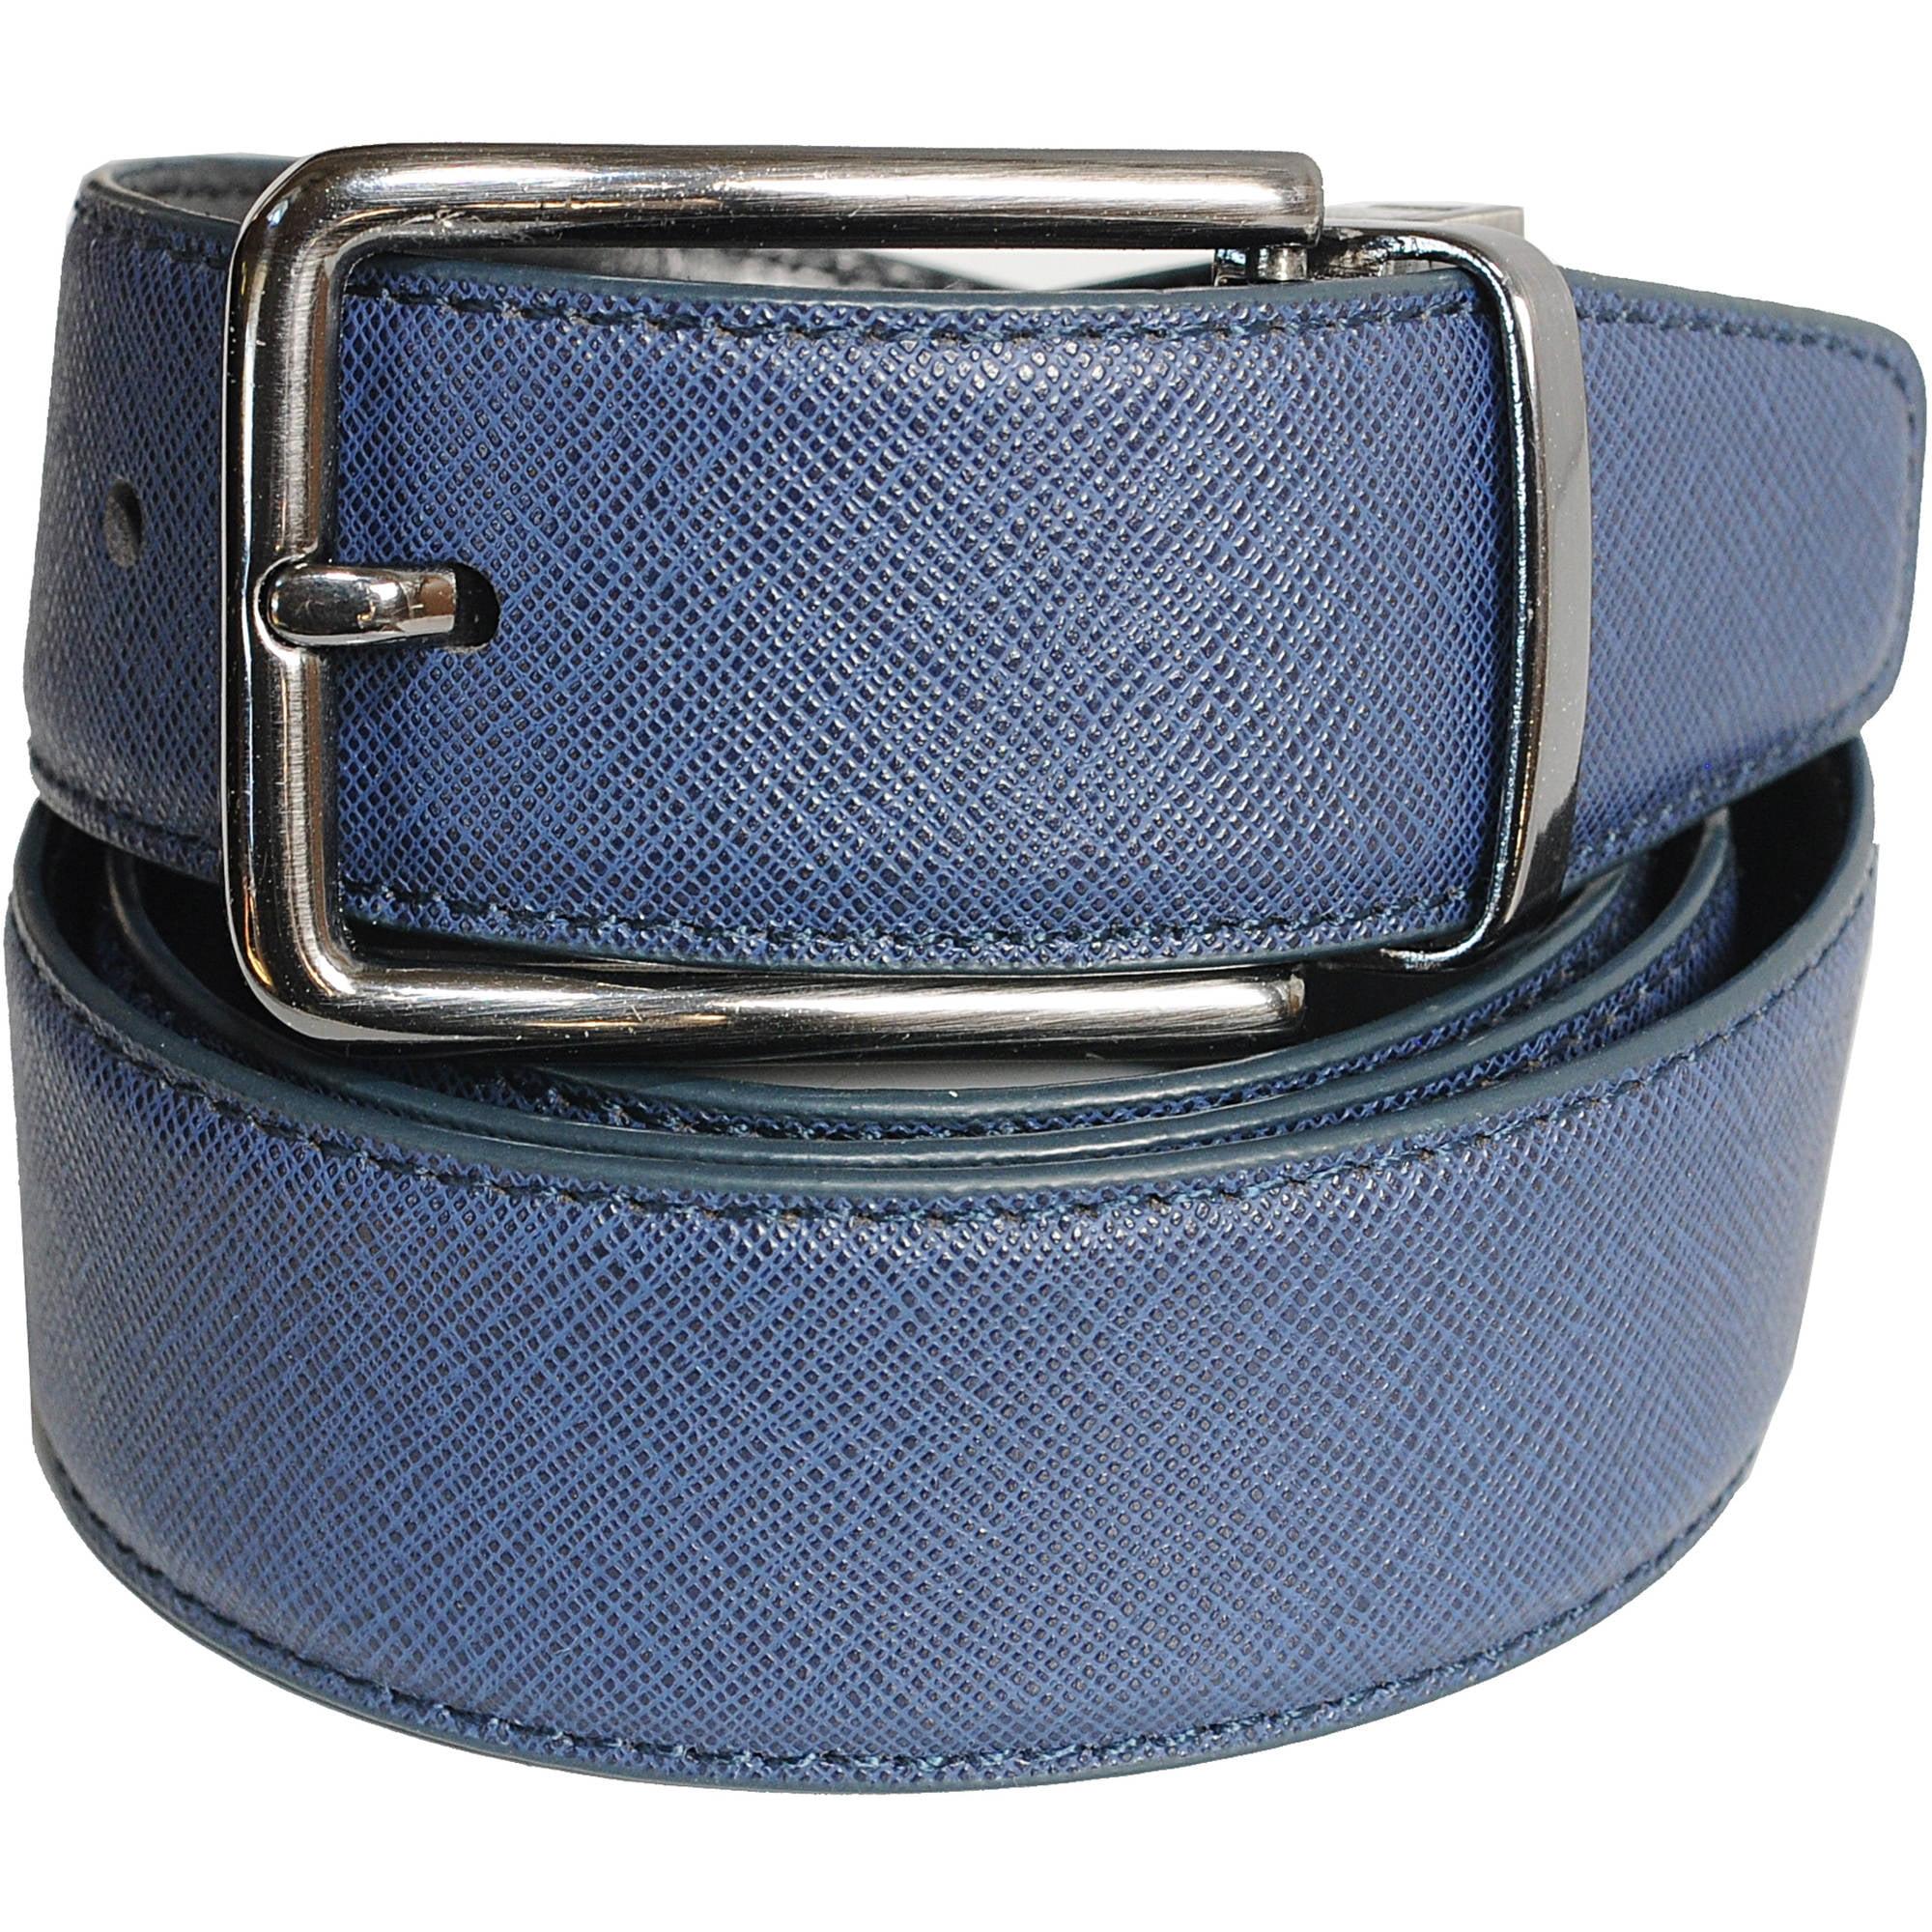 Fionte - Men's Reversible Leather Belt